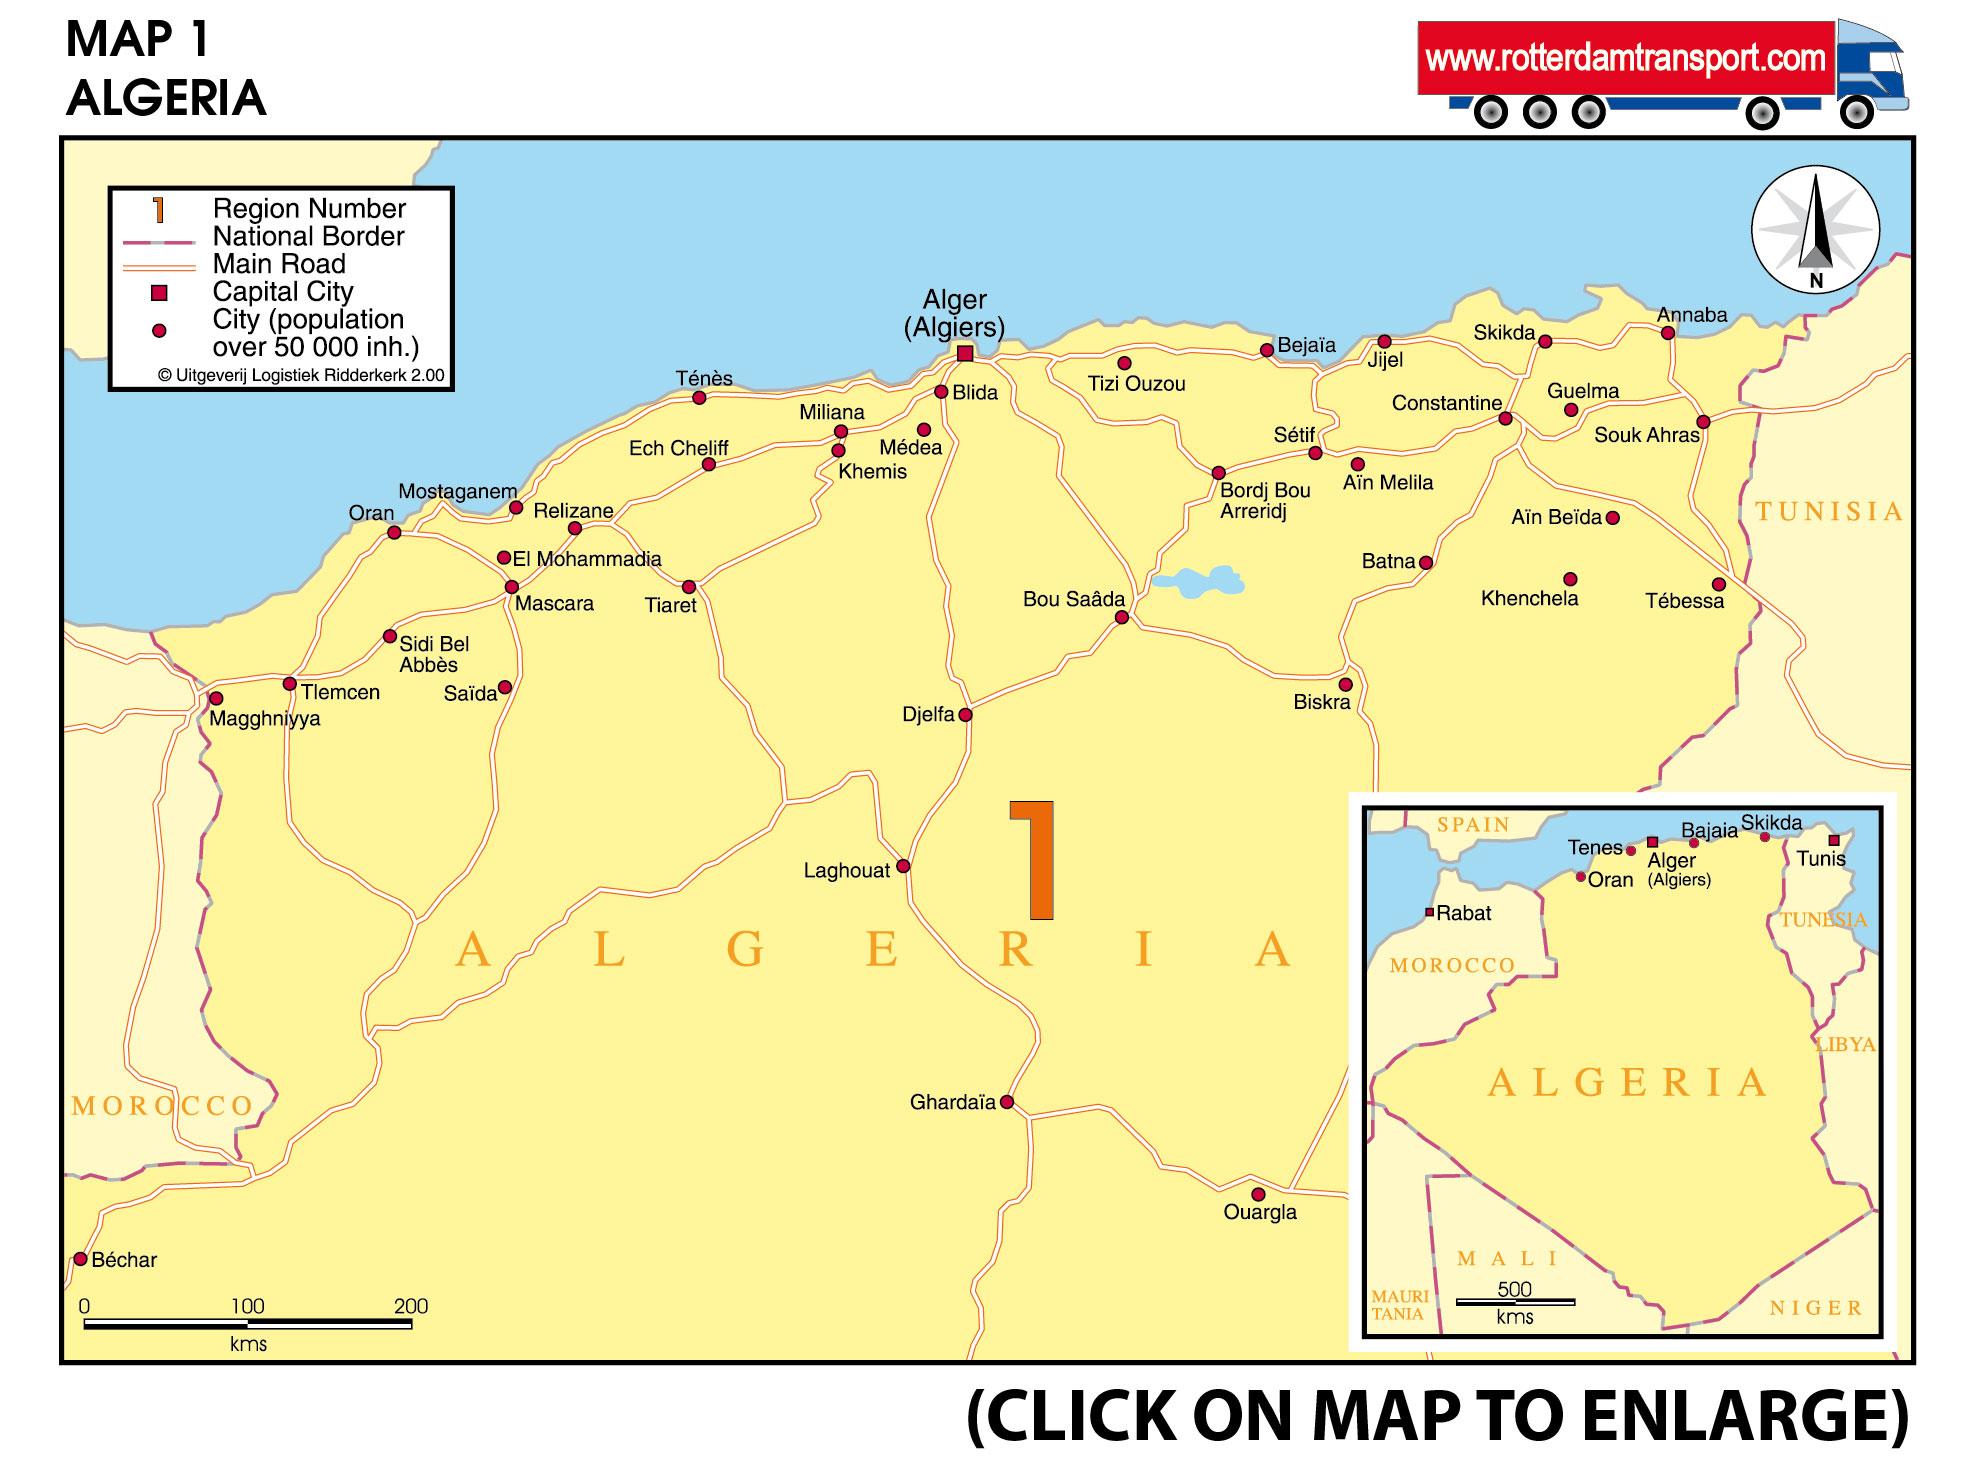 Wwwrotterdamtransportcom Maps Groupage By Road - Liechtenstein maps with countries